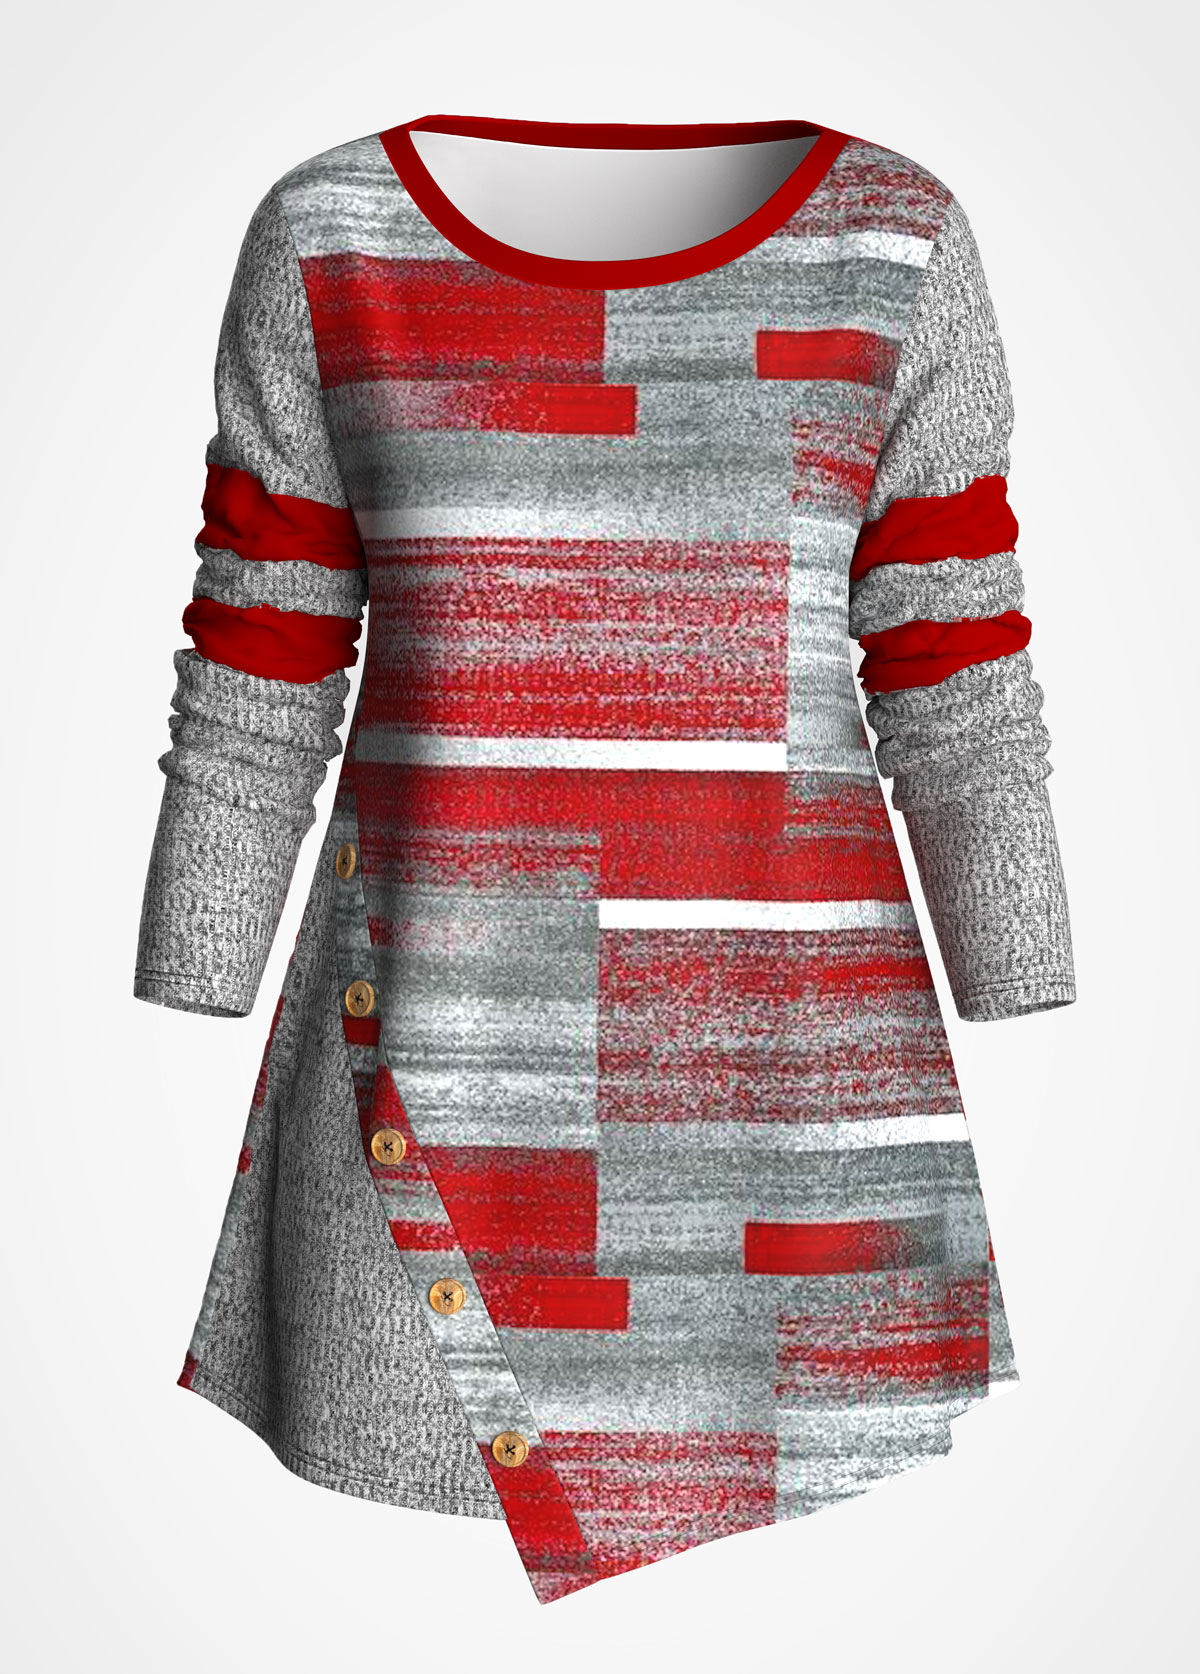 ROTITA Asymmetric Hem Contrast Geometric Print T Shirt